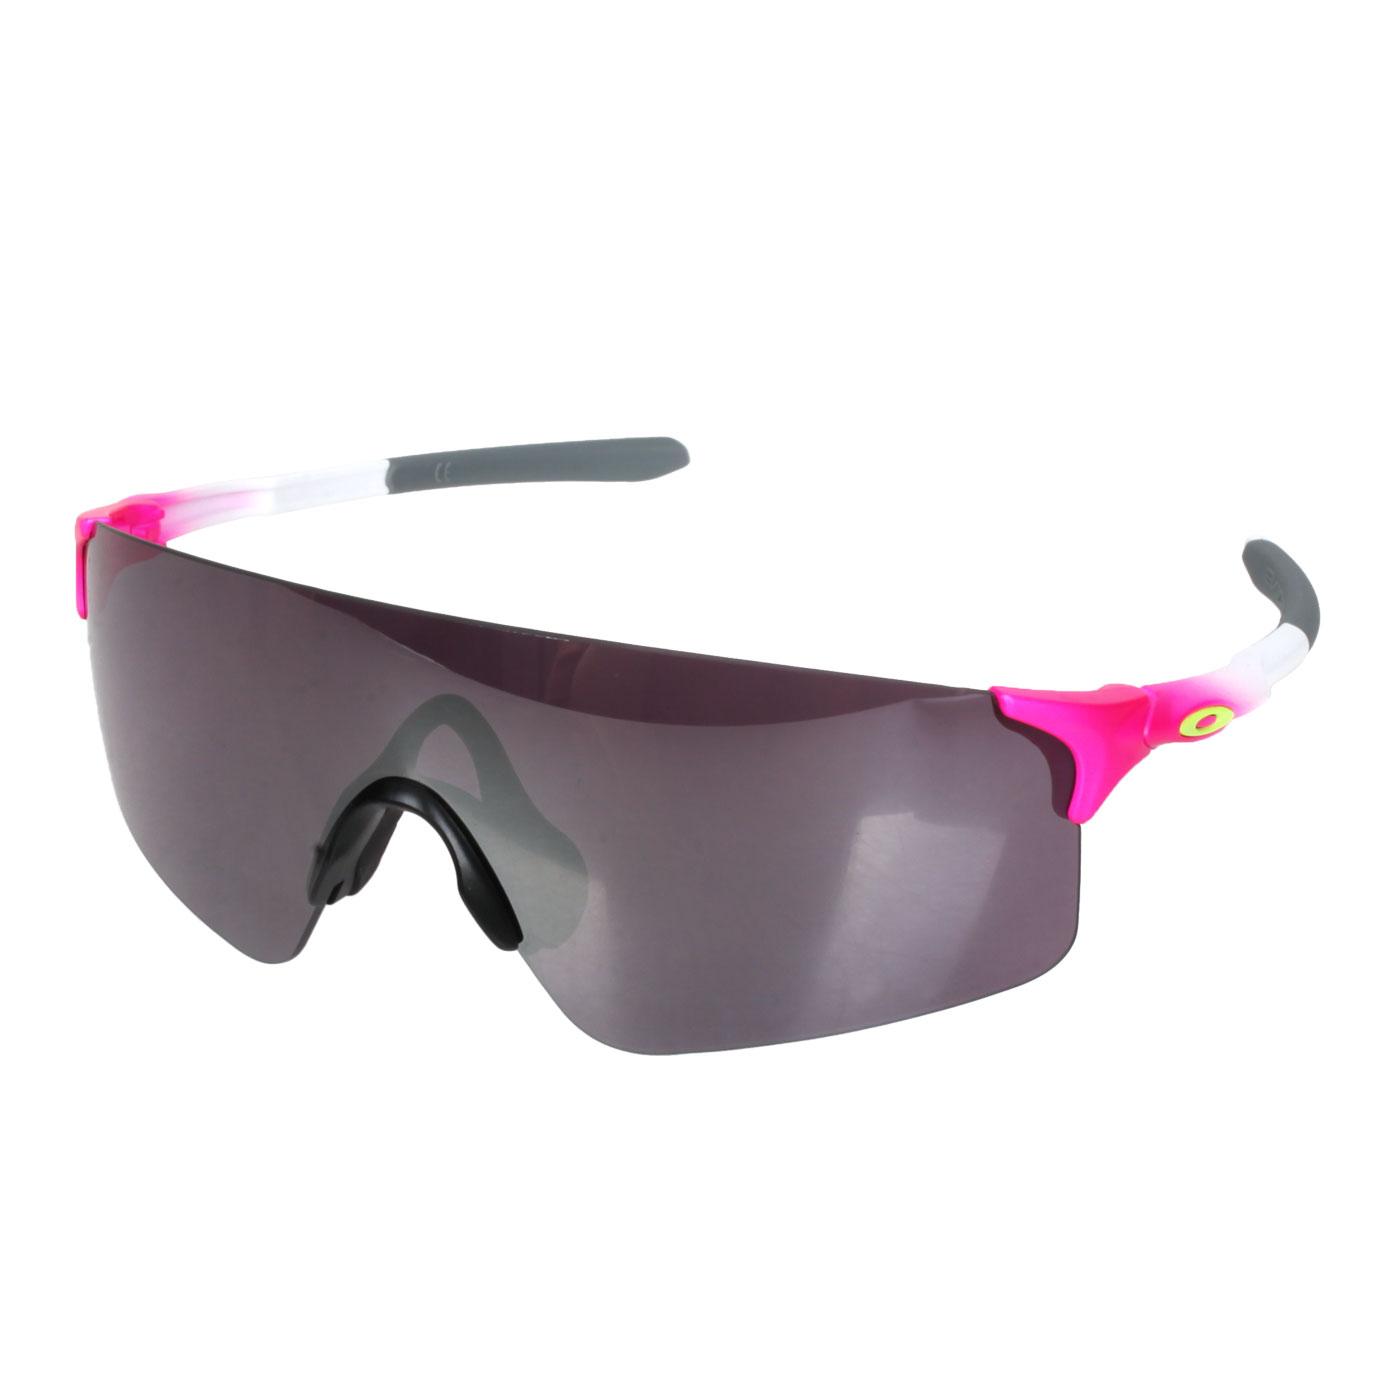 OAKLEY EVZERO BLADES 一般太陽眼鏡 (附硬盒) OAK-OO9454-0838